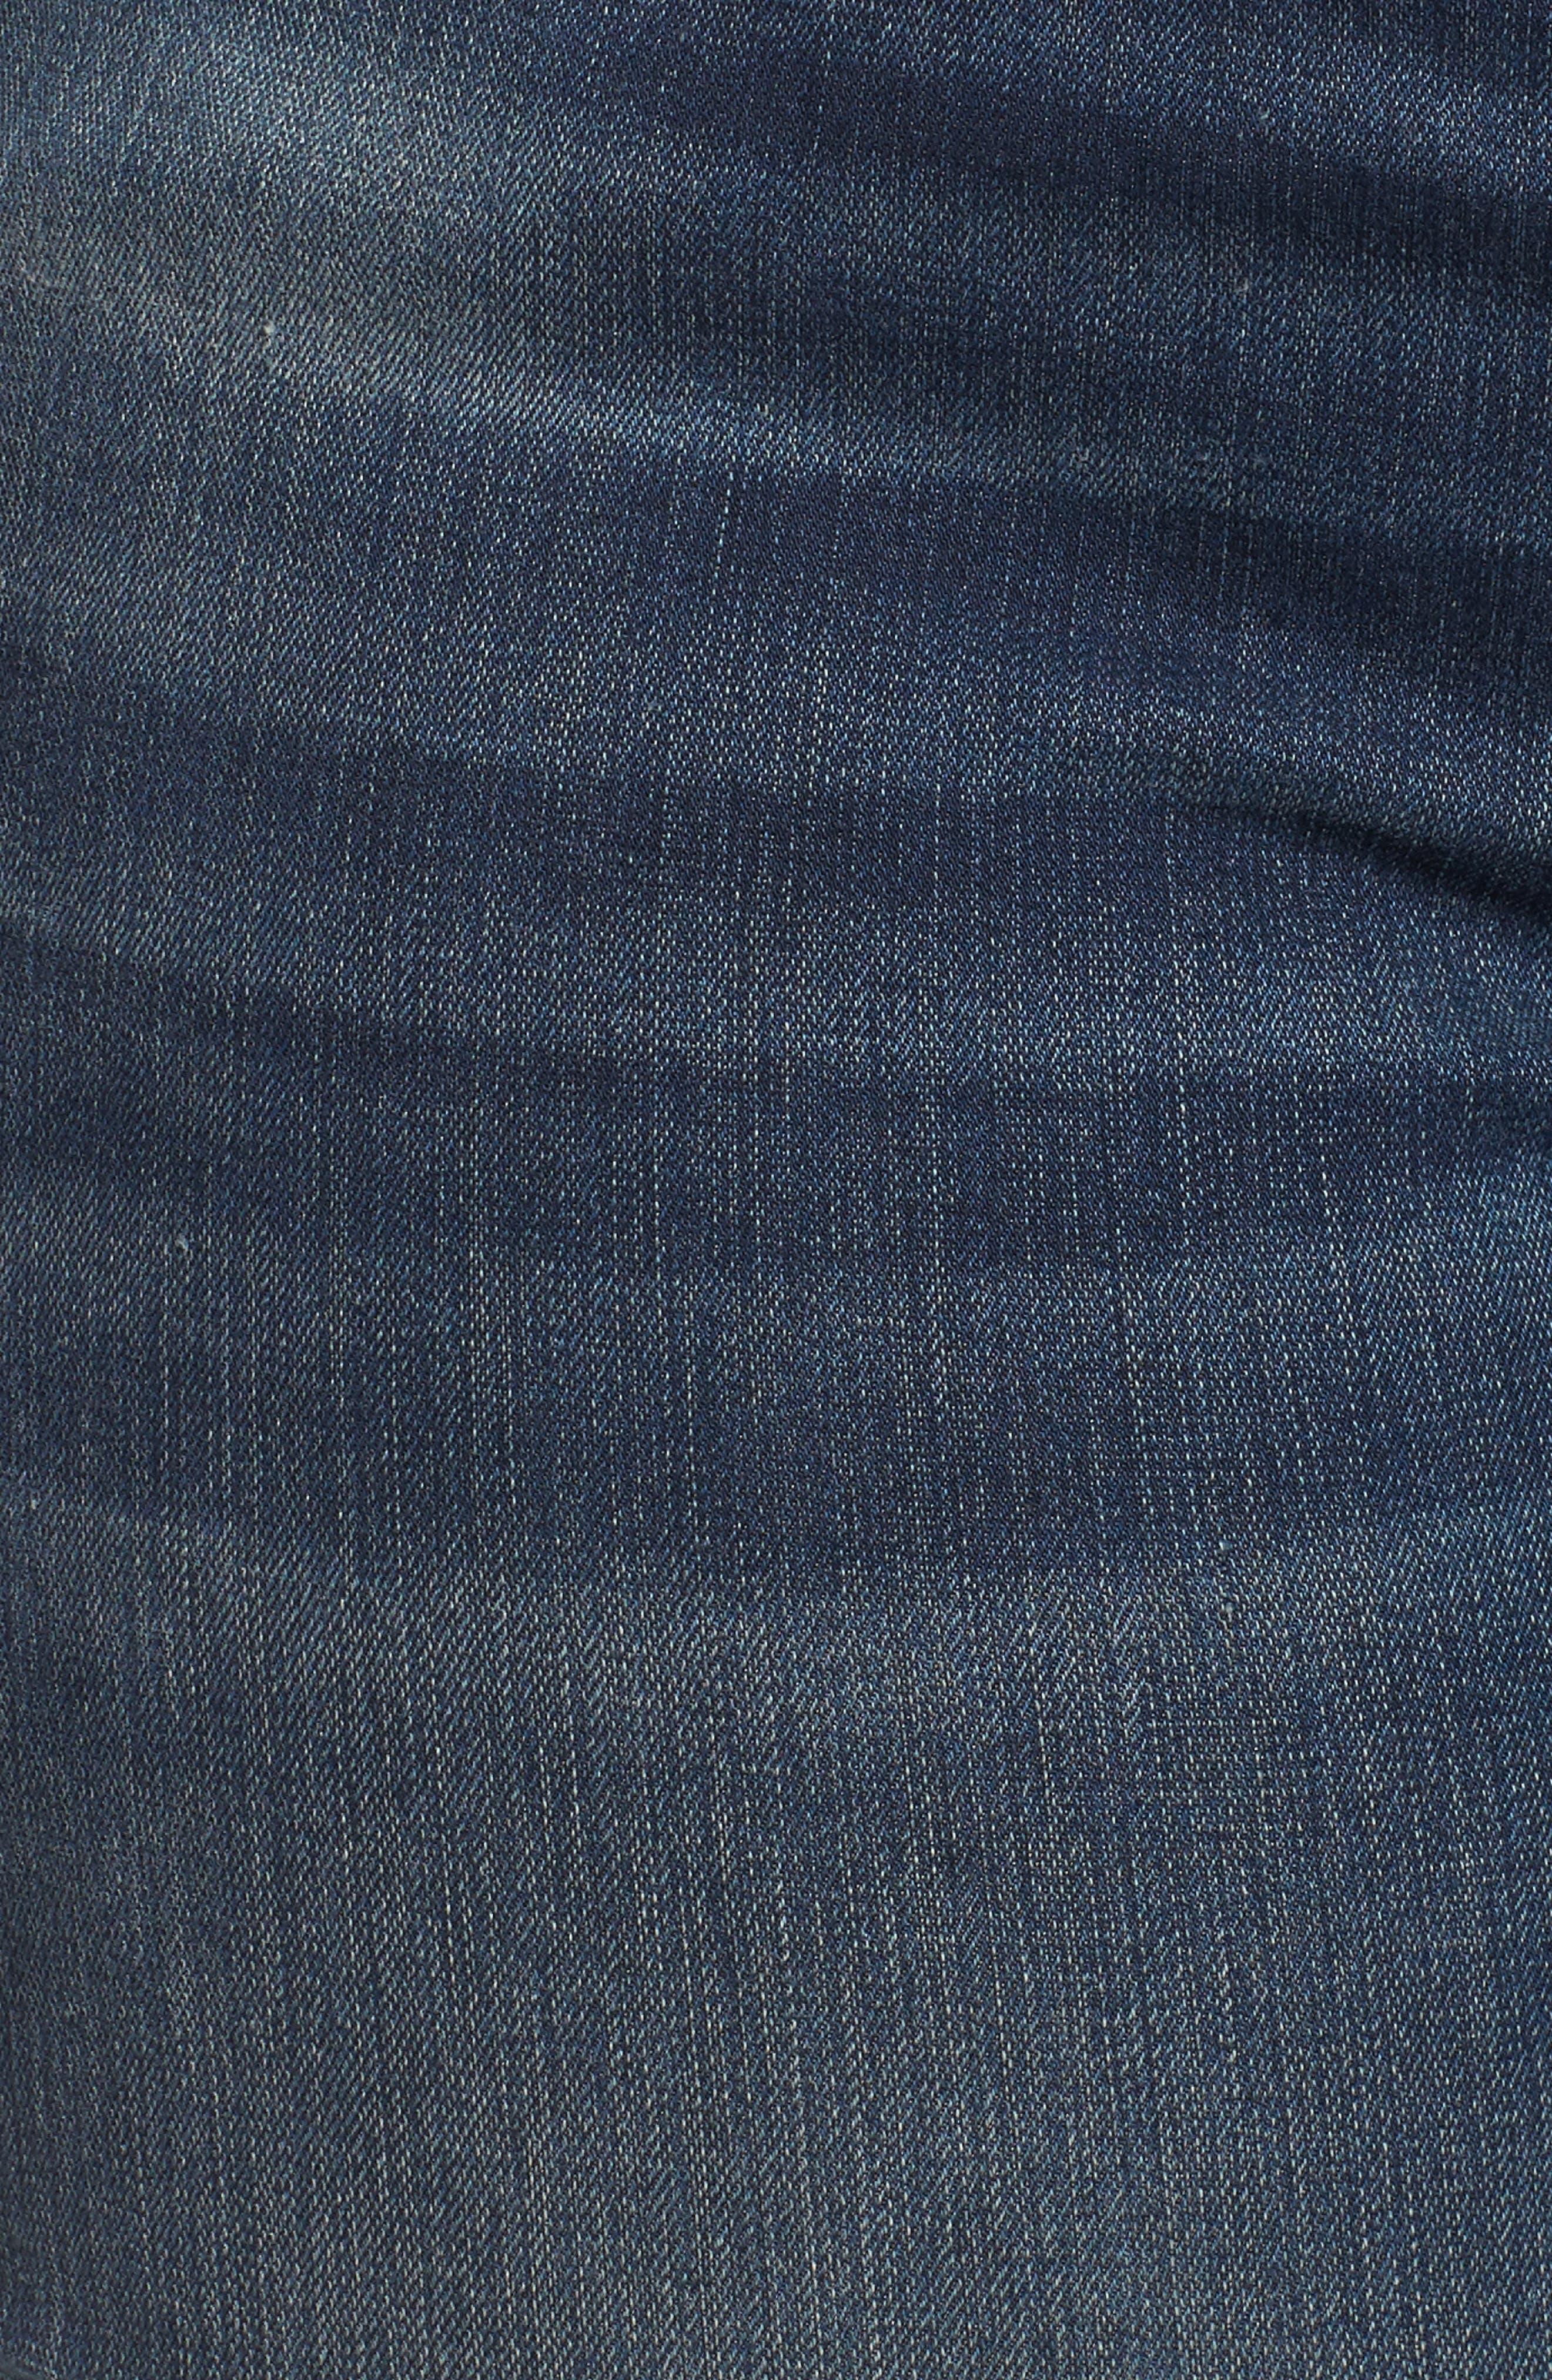 Alternate Image 5  - SLINK Jeans Step Hem Skinny Jeans (Danielle) (Plus Size)